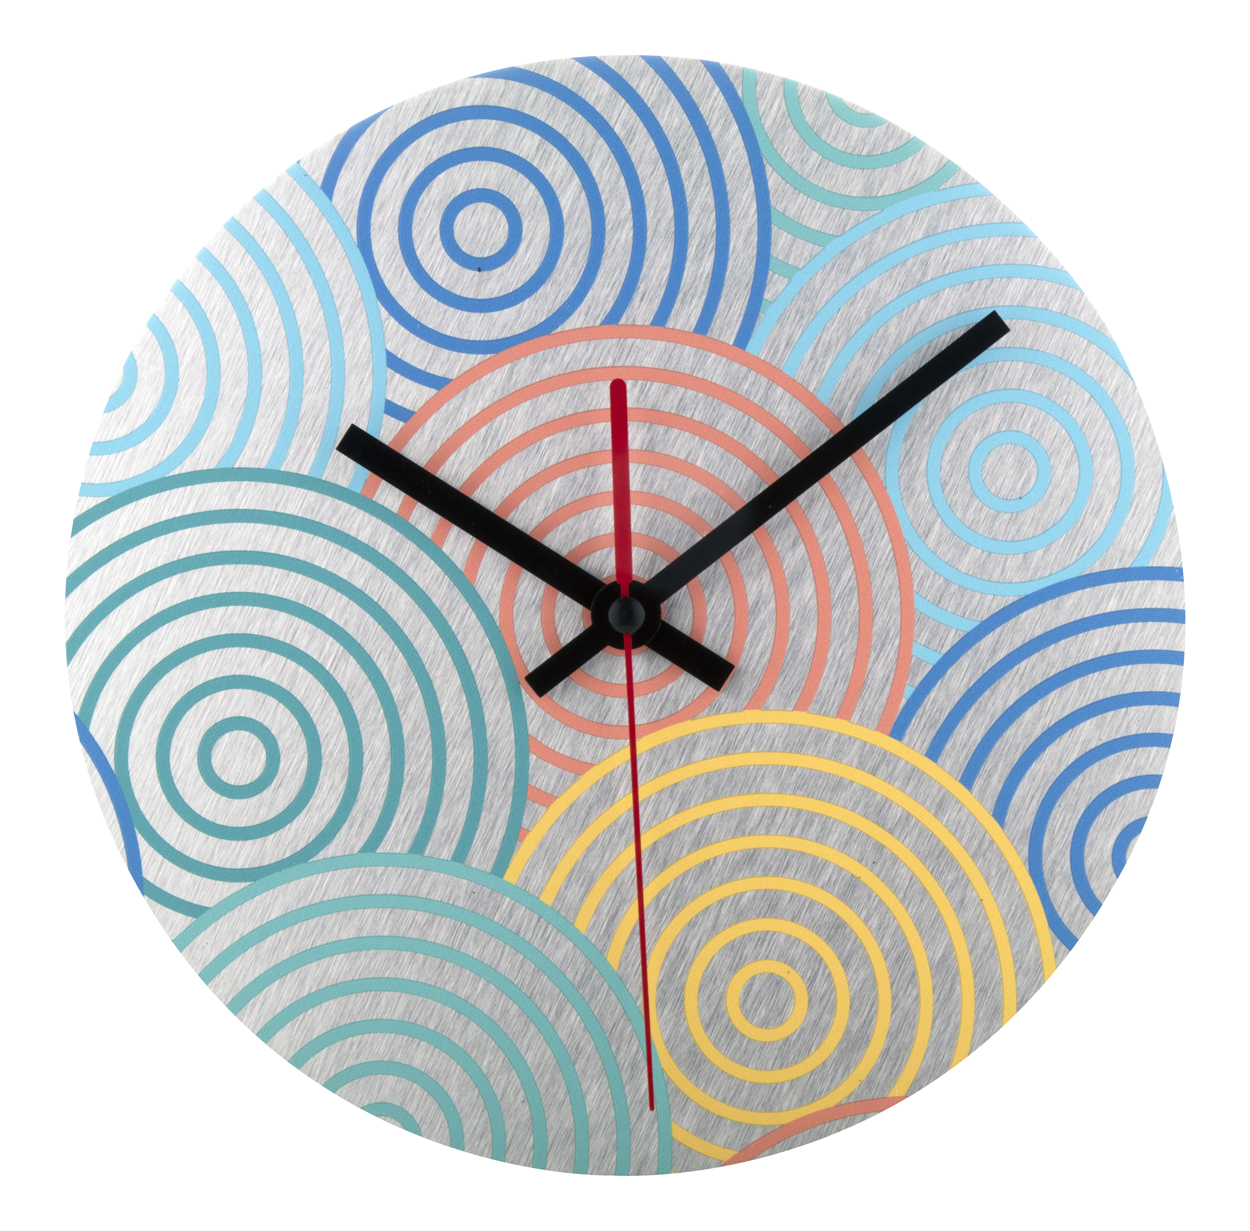 BeTime Alu D wall clock